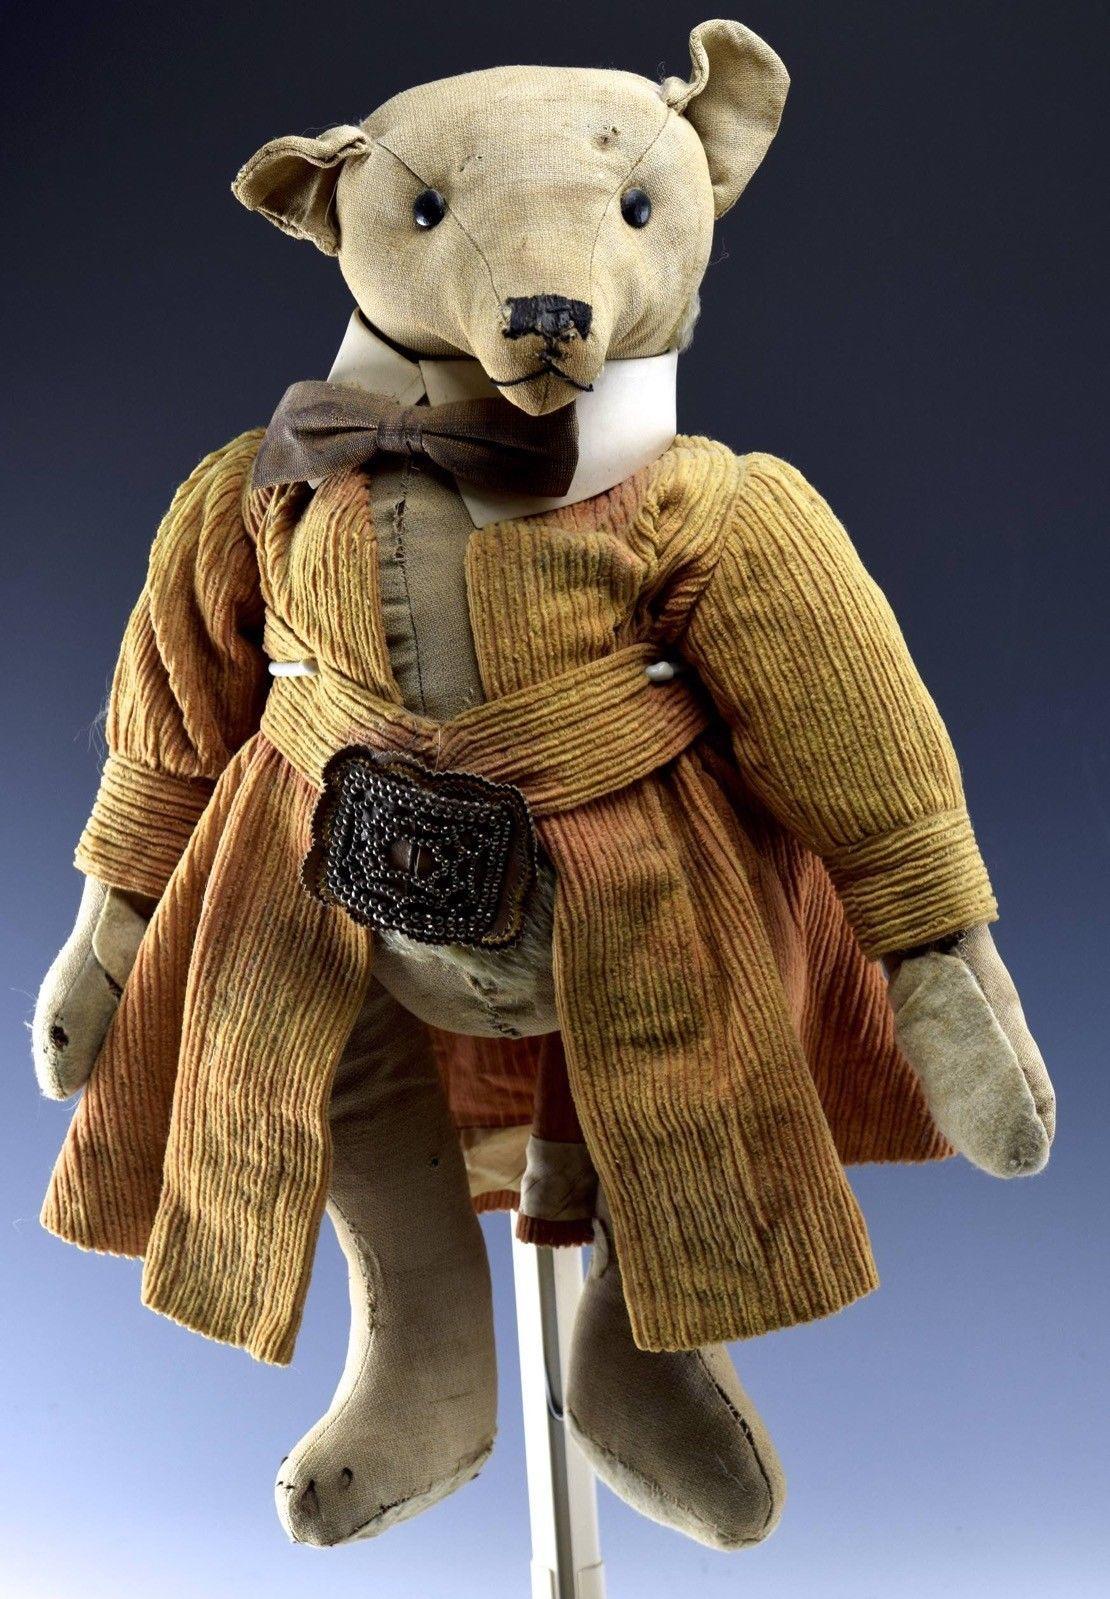 Not Old I Think And Not Steiff But An Odd And Handsome Critter All The Same Mohair Teddy Bear Teddy Bear Steiff